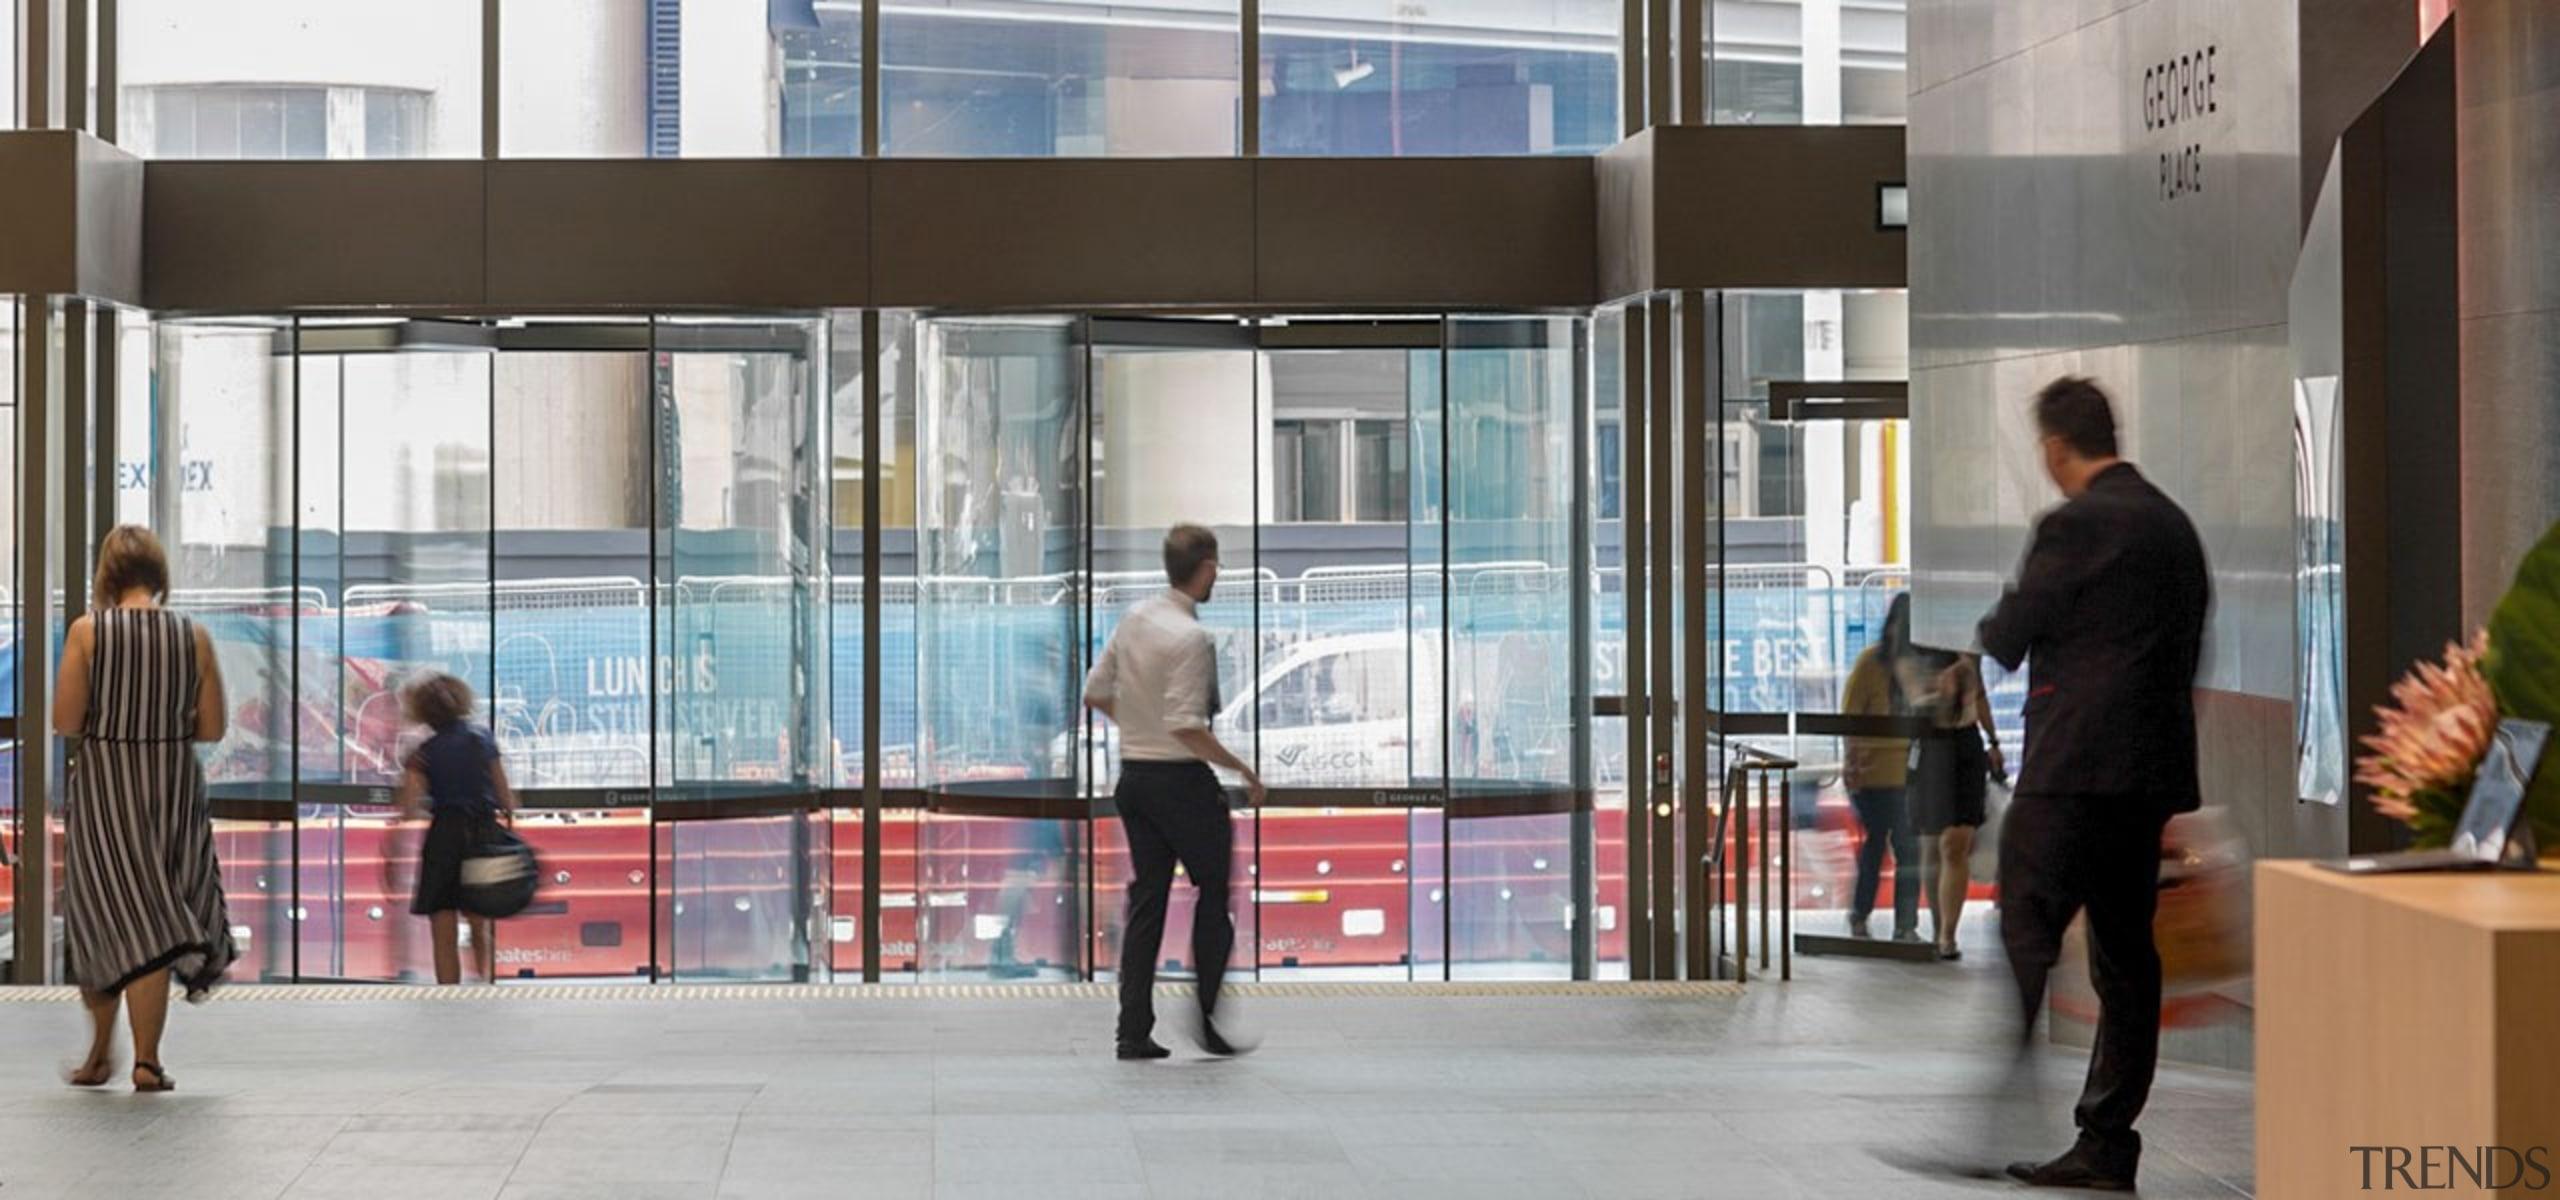 George Place 06 - architecture   building   architecture, building, facade, glass, metropolitan area, pedestrian, window, gray